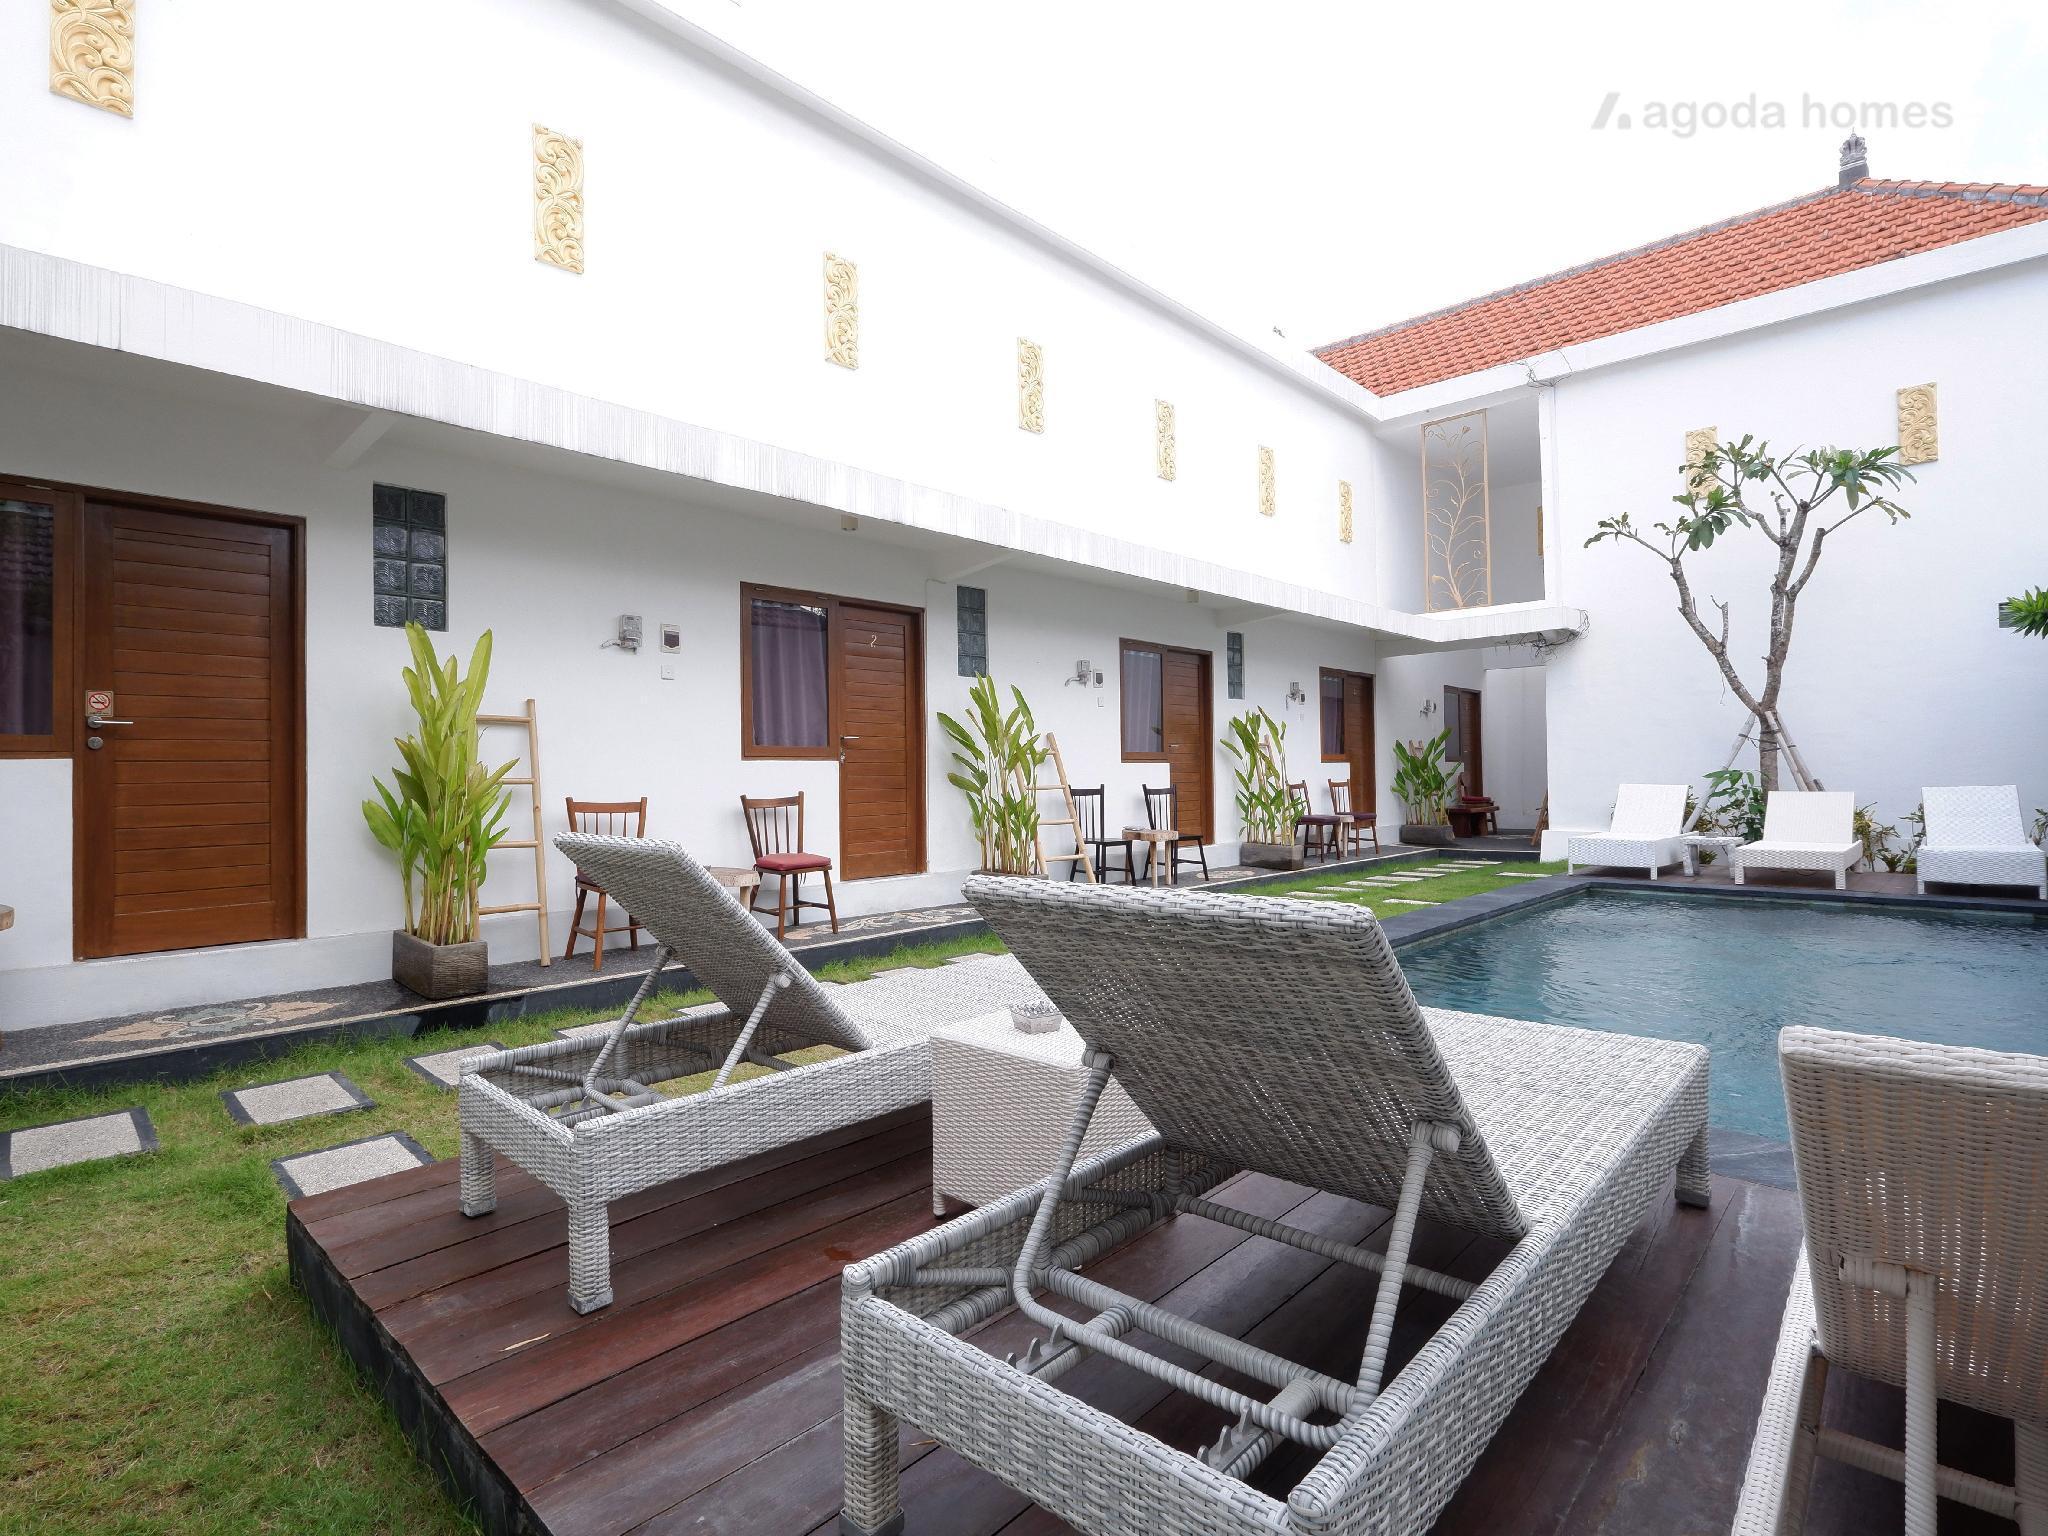 1 Bedroom Apartment At Seminyak And Shared Pool